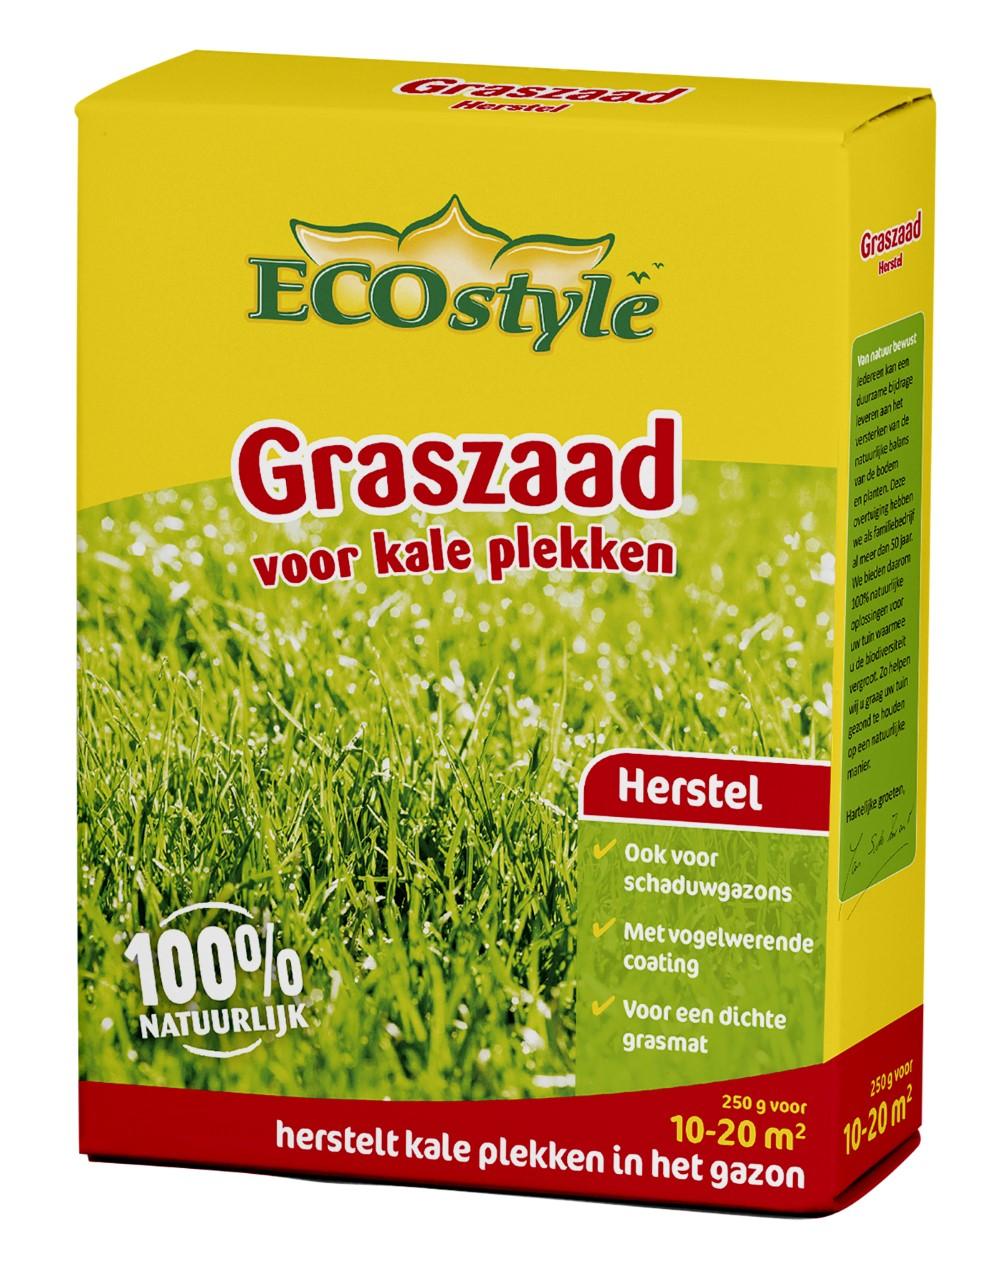 Ecostyle Graszaad Herstel 250 g